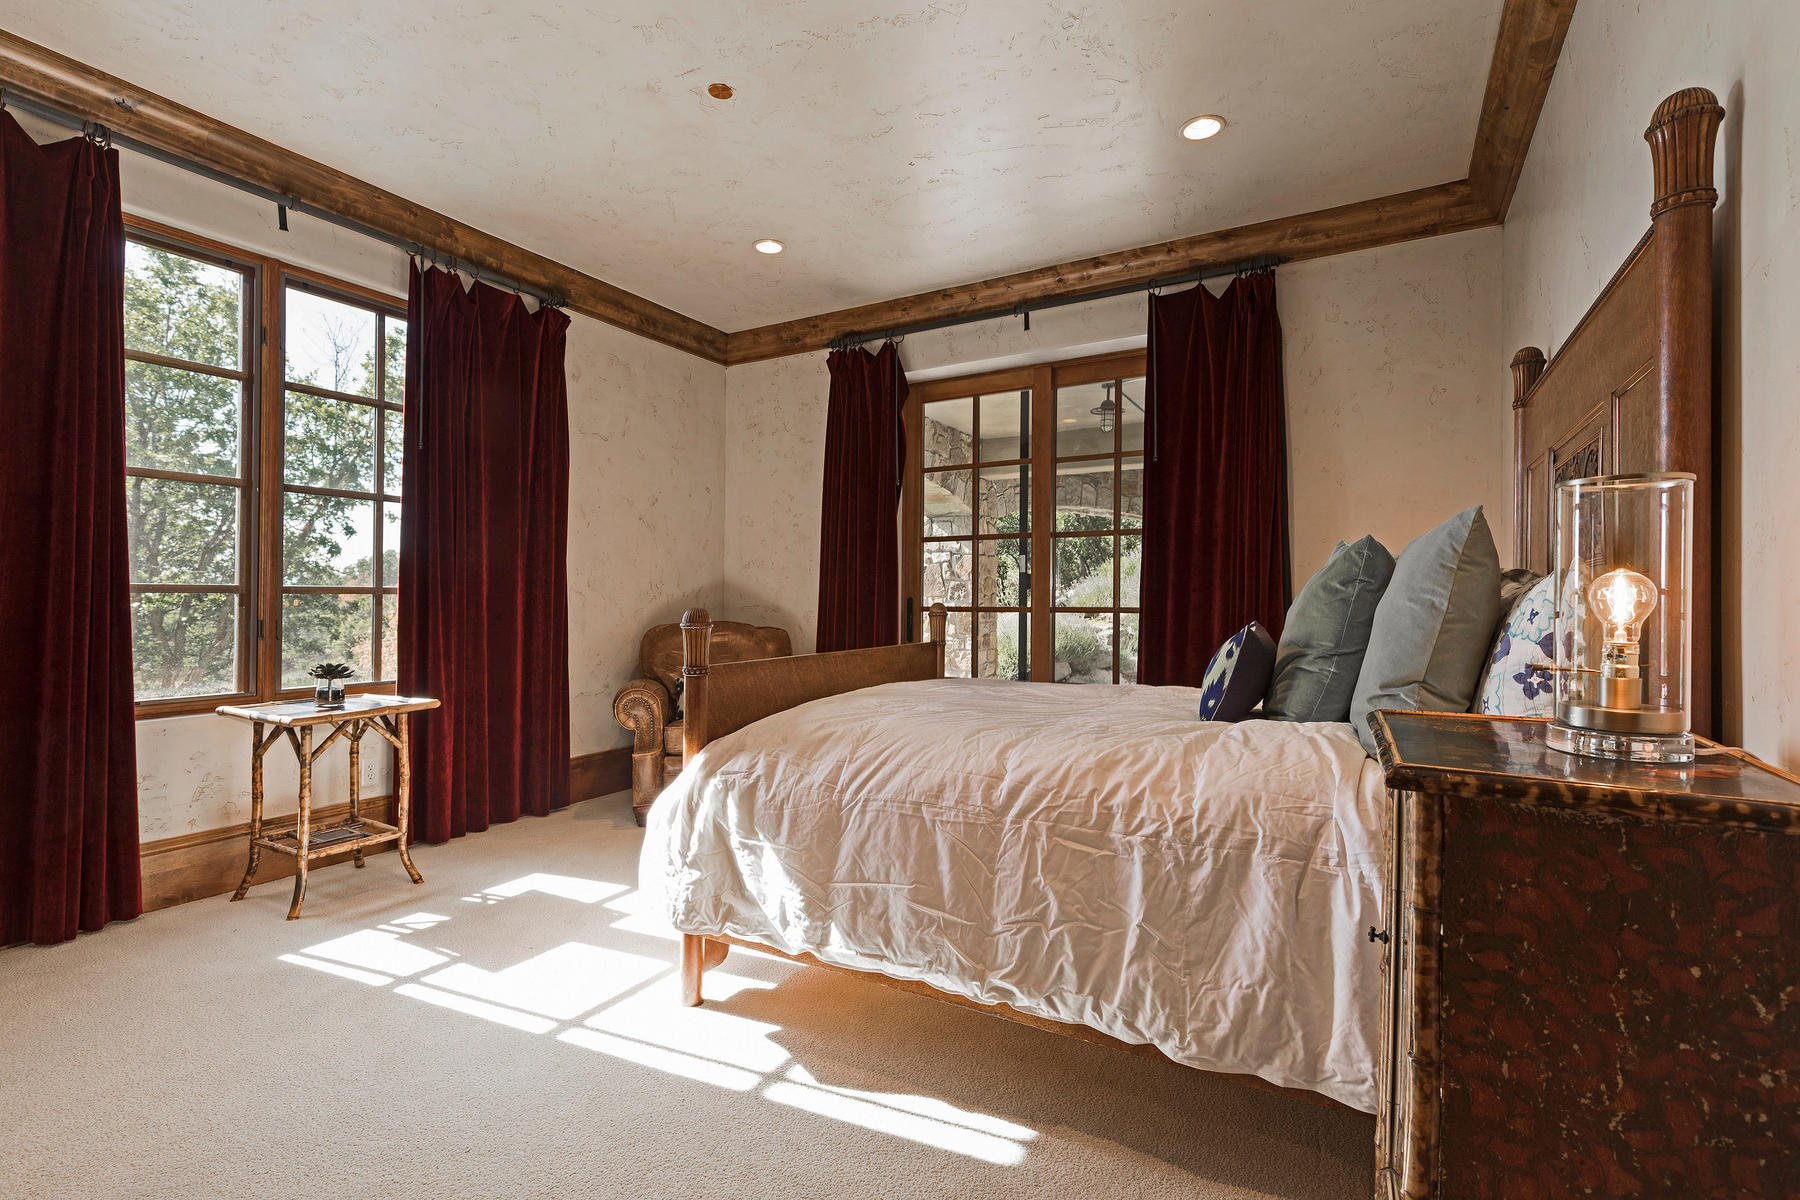 Additional photo for property listing at Elegant Glenwild Estate with Guest House 1035 Primrose Pl Park City, Utah 84098 United States